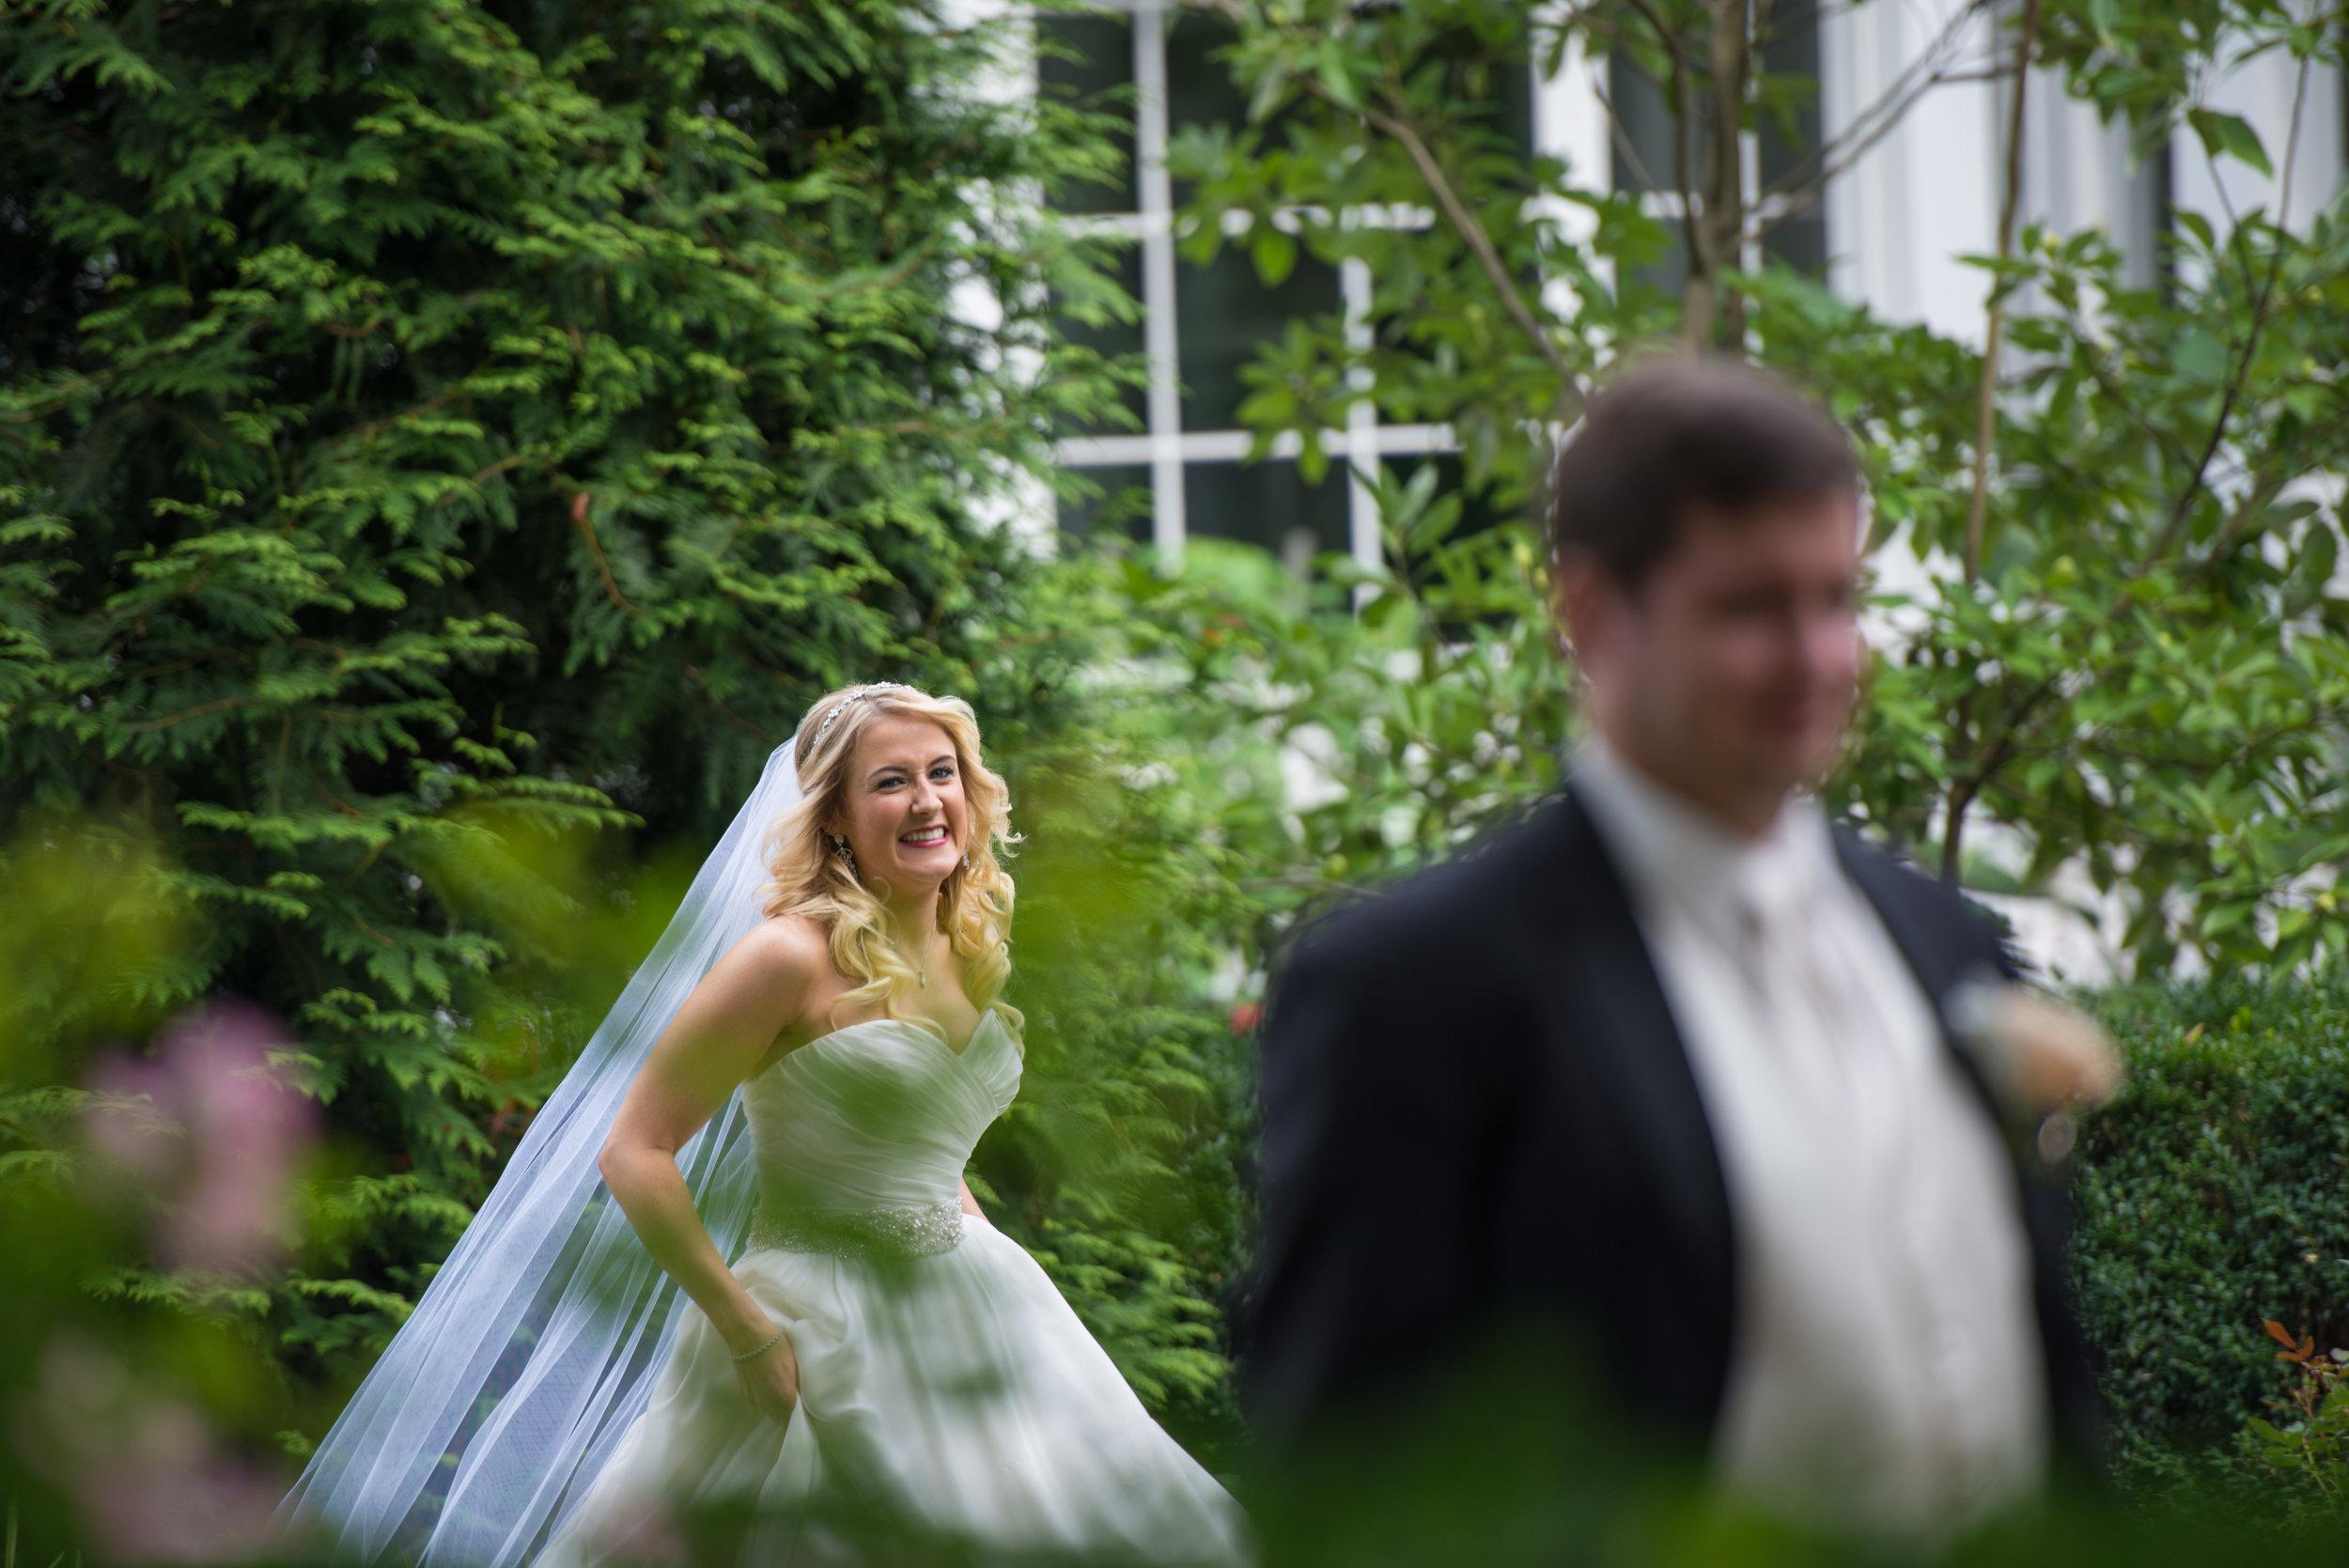 Wedding First Look Photos00915.jpg